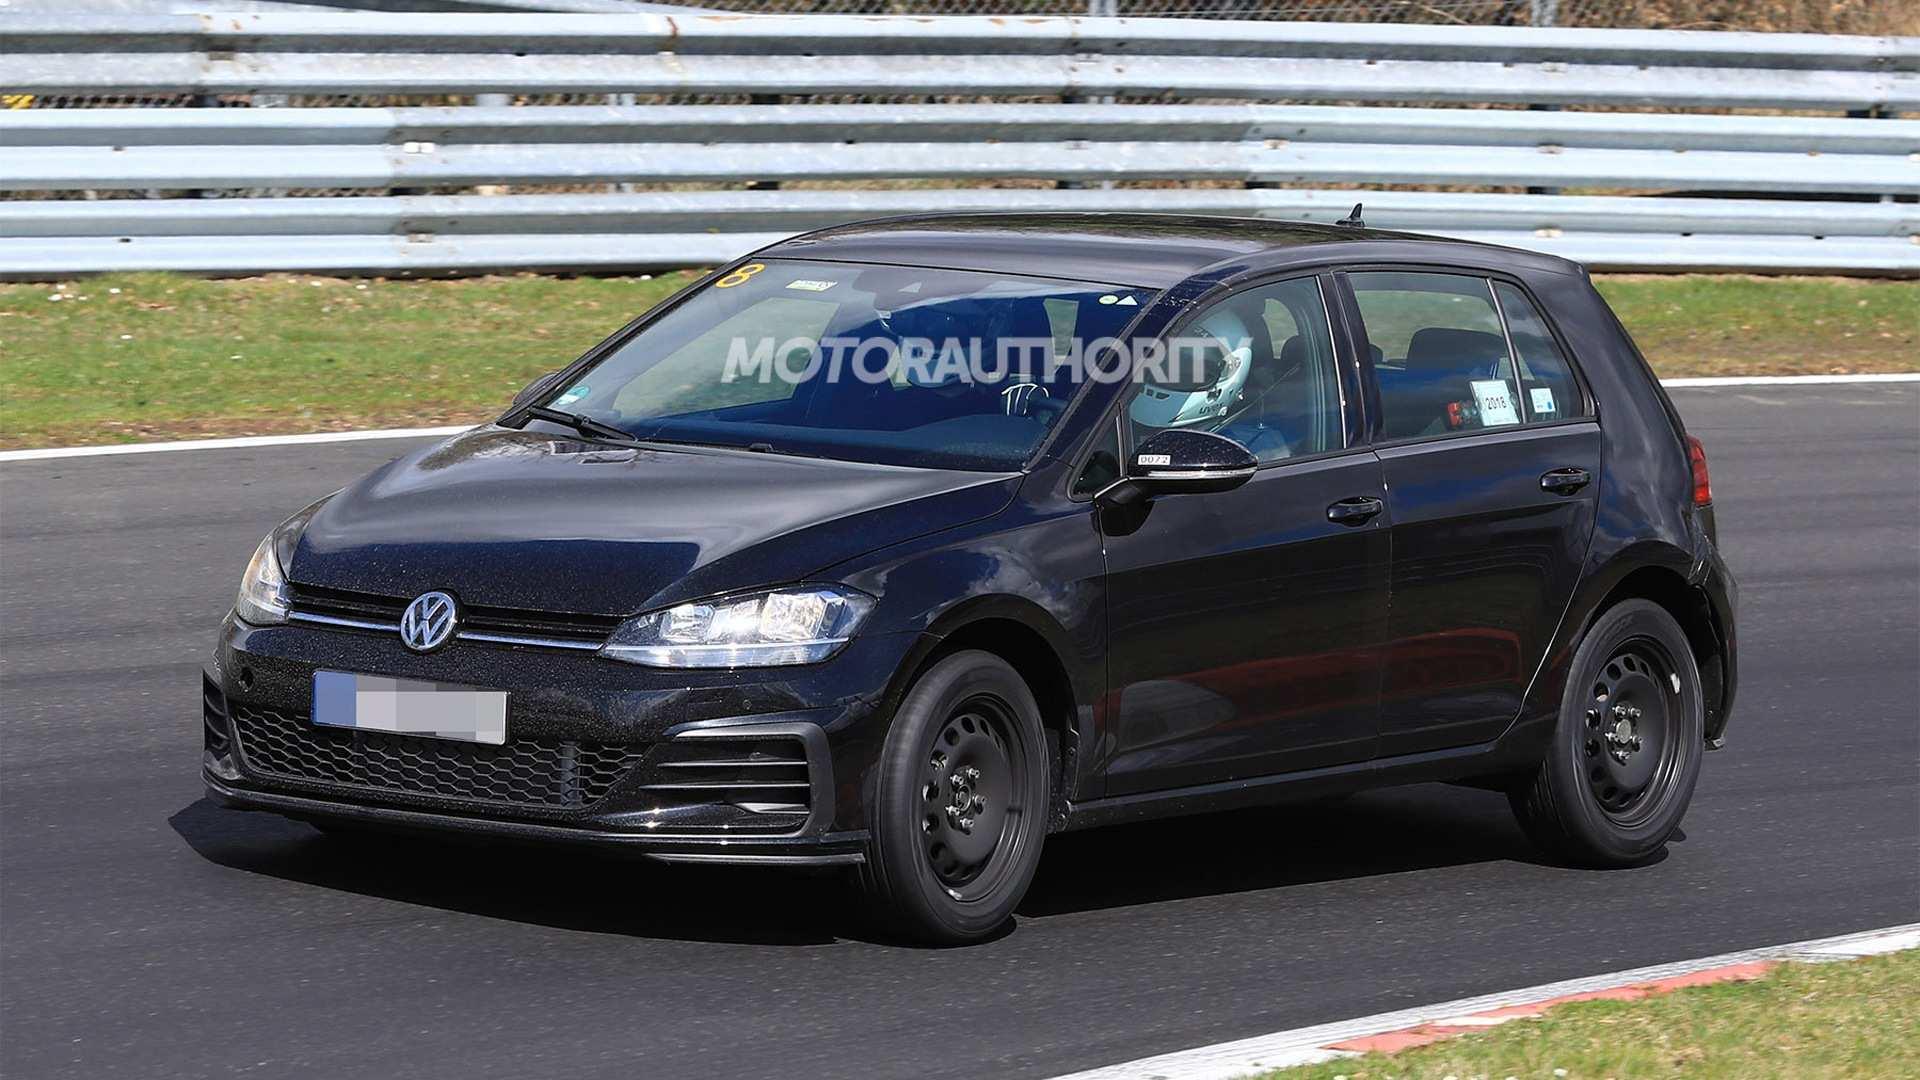 61 New 2020 Vw Golf Sportwagen New Concept with 2020 Vw Golf Sportwagen